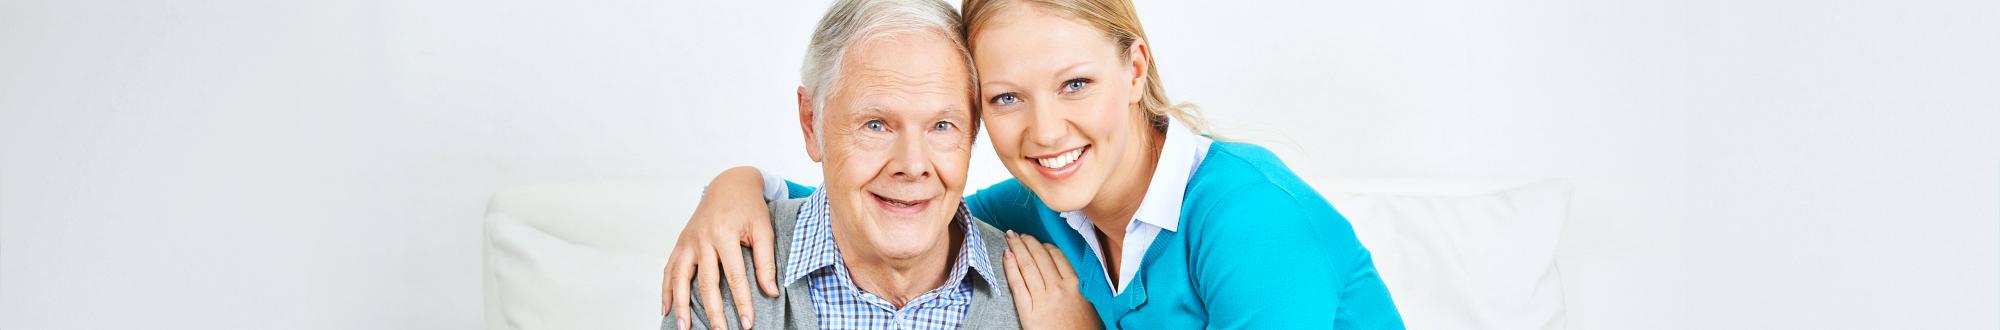 senior man with her caregiver